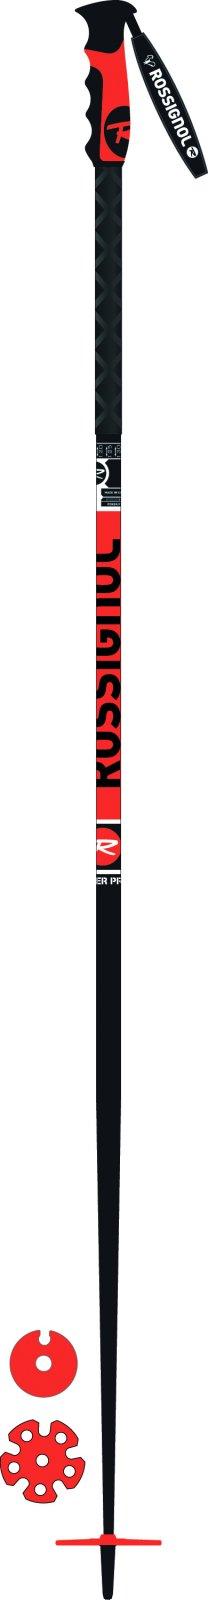 Rossignol Poker Pro Ski Poles 2020